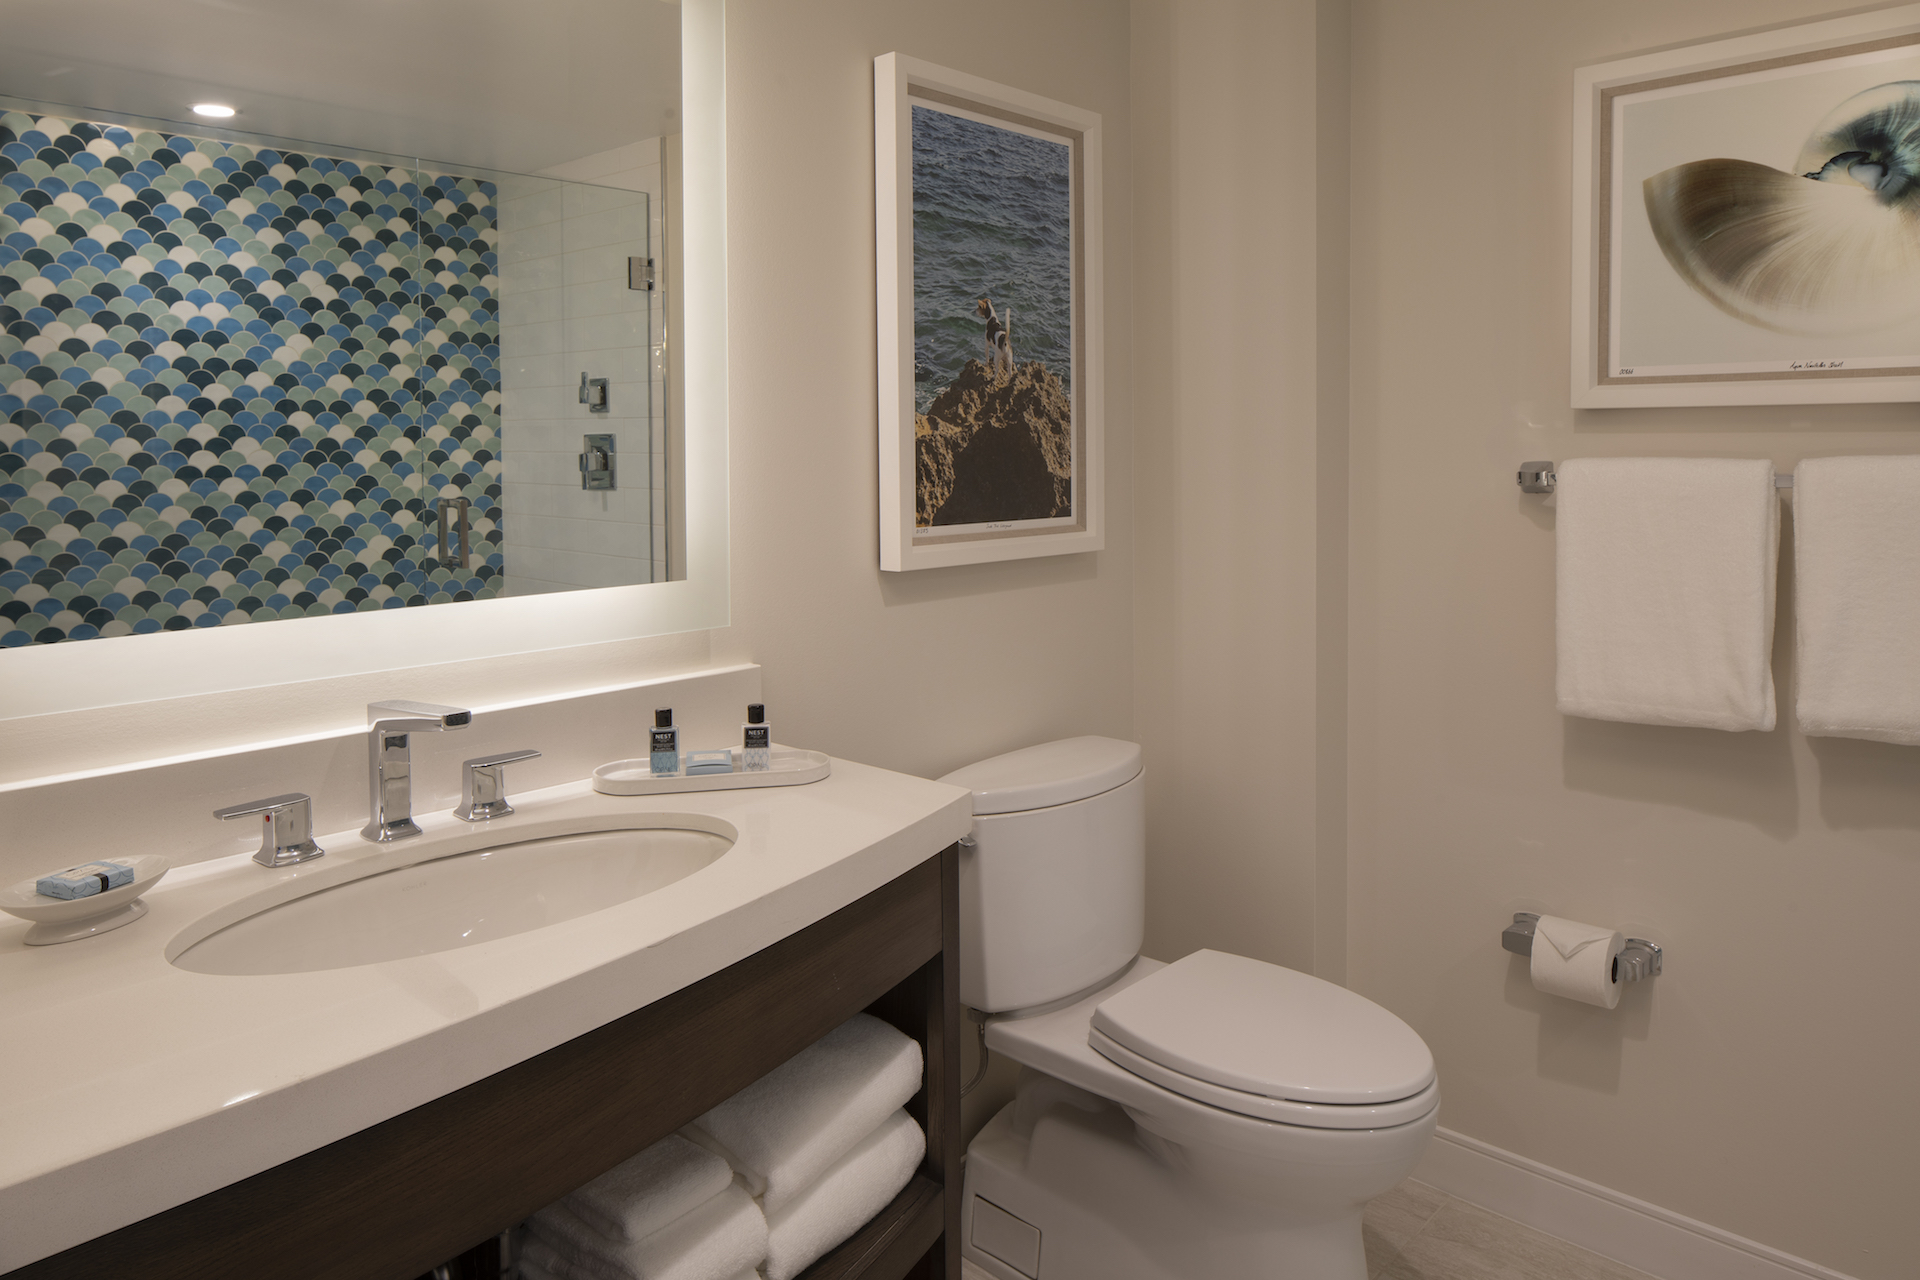 The Laureate Key West guest room bathroom sink and toilet